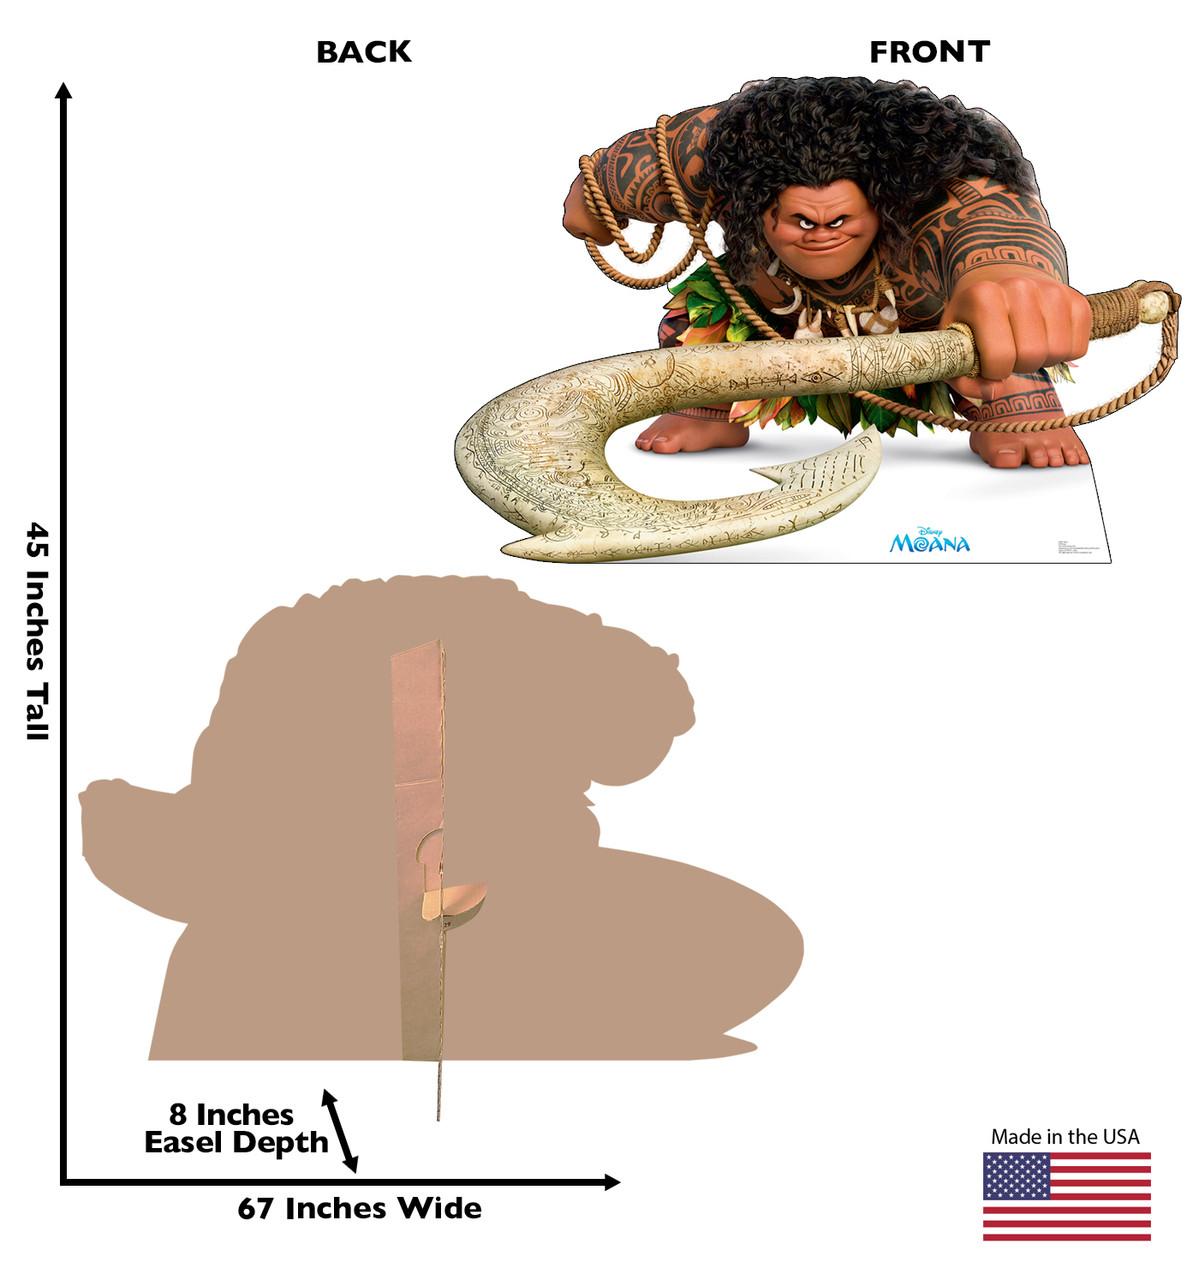 Maui - Moana-Cardboard Cutout 2441